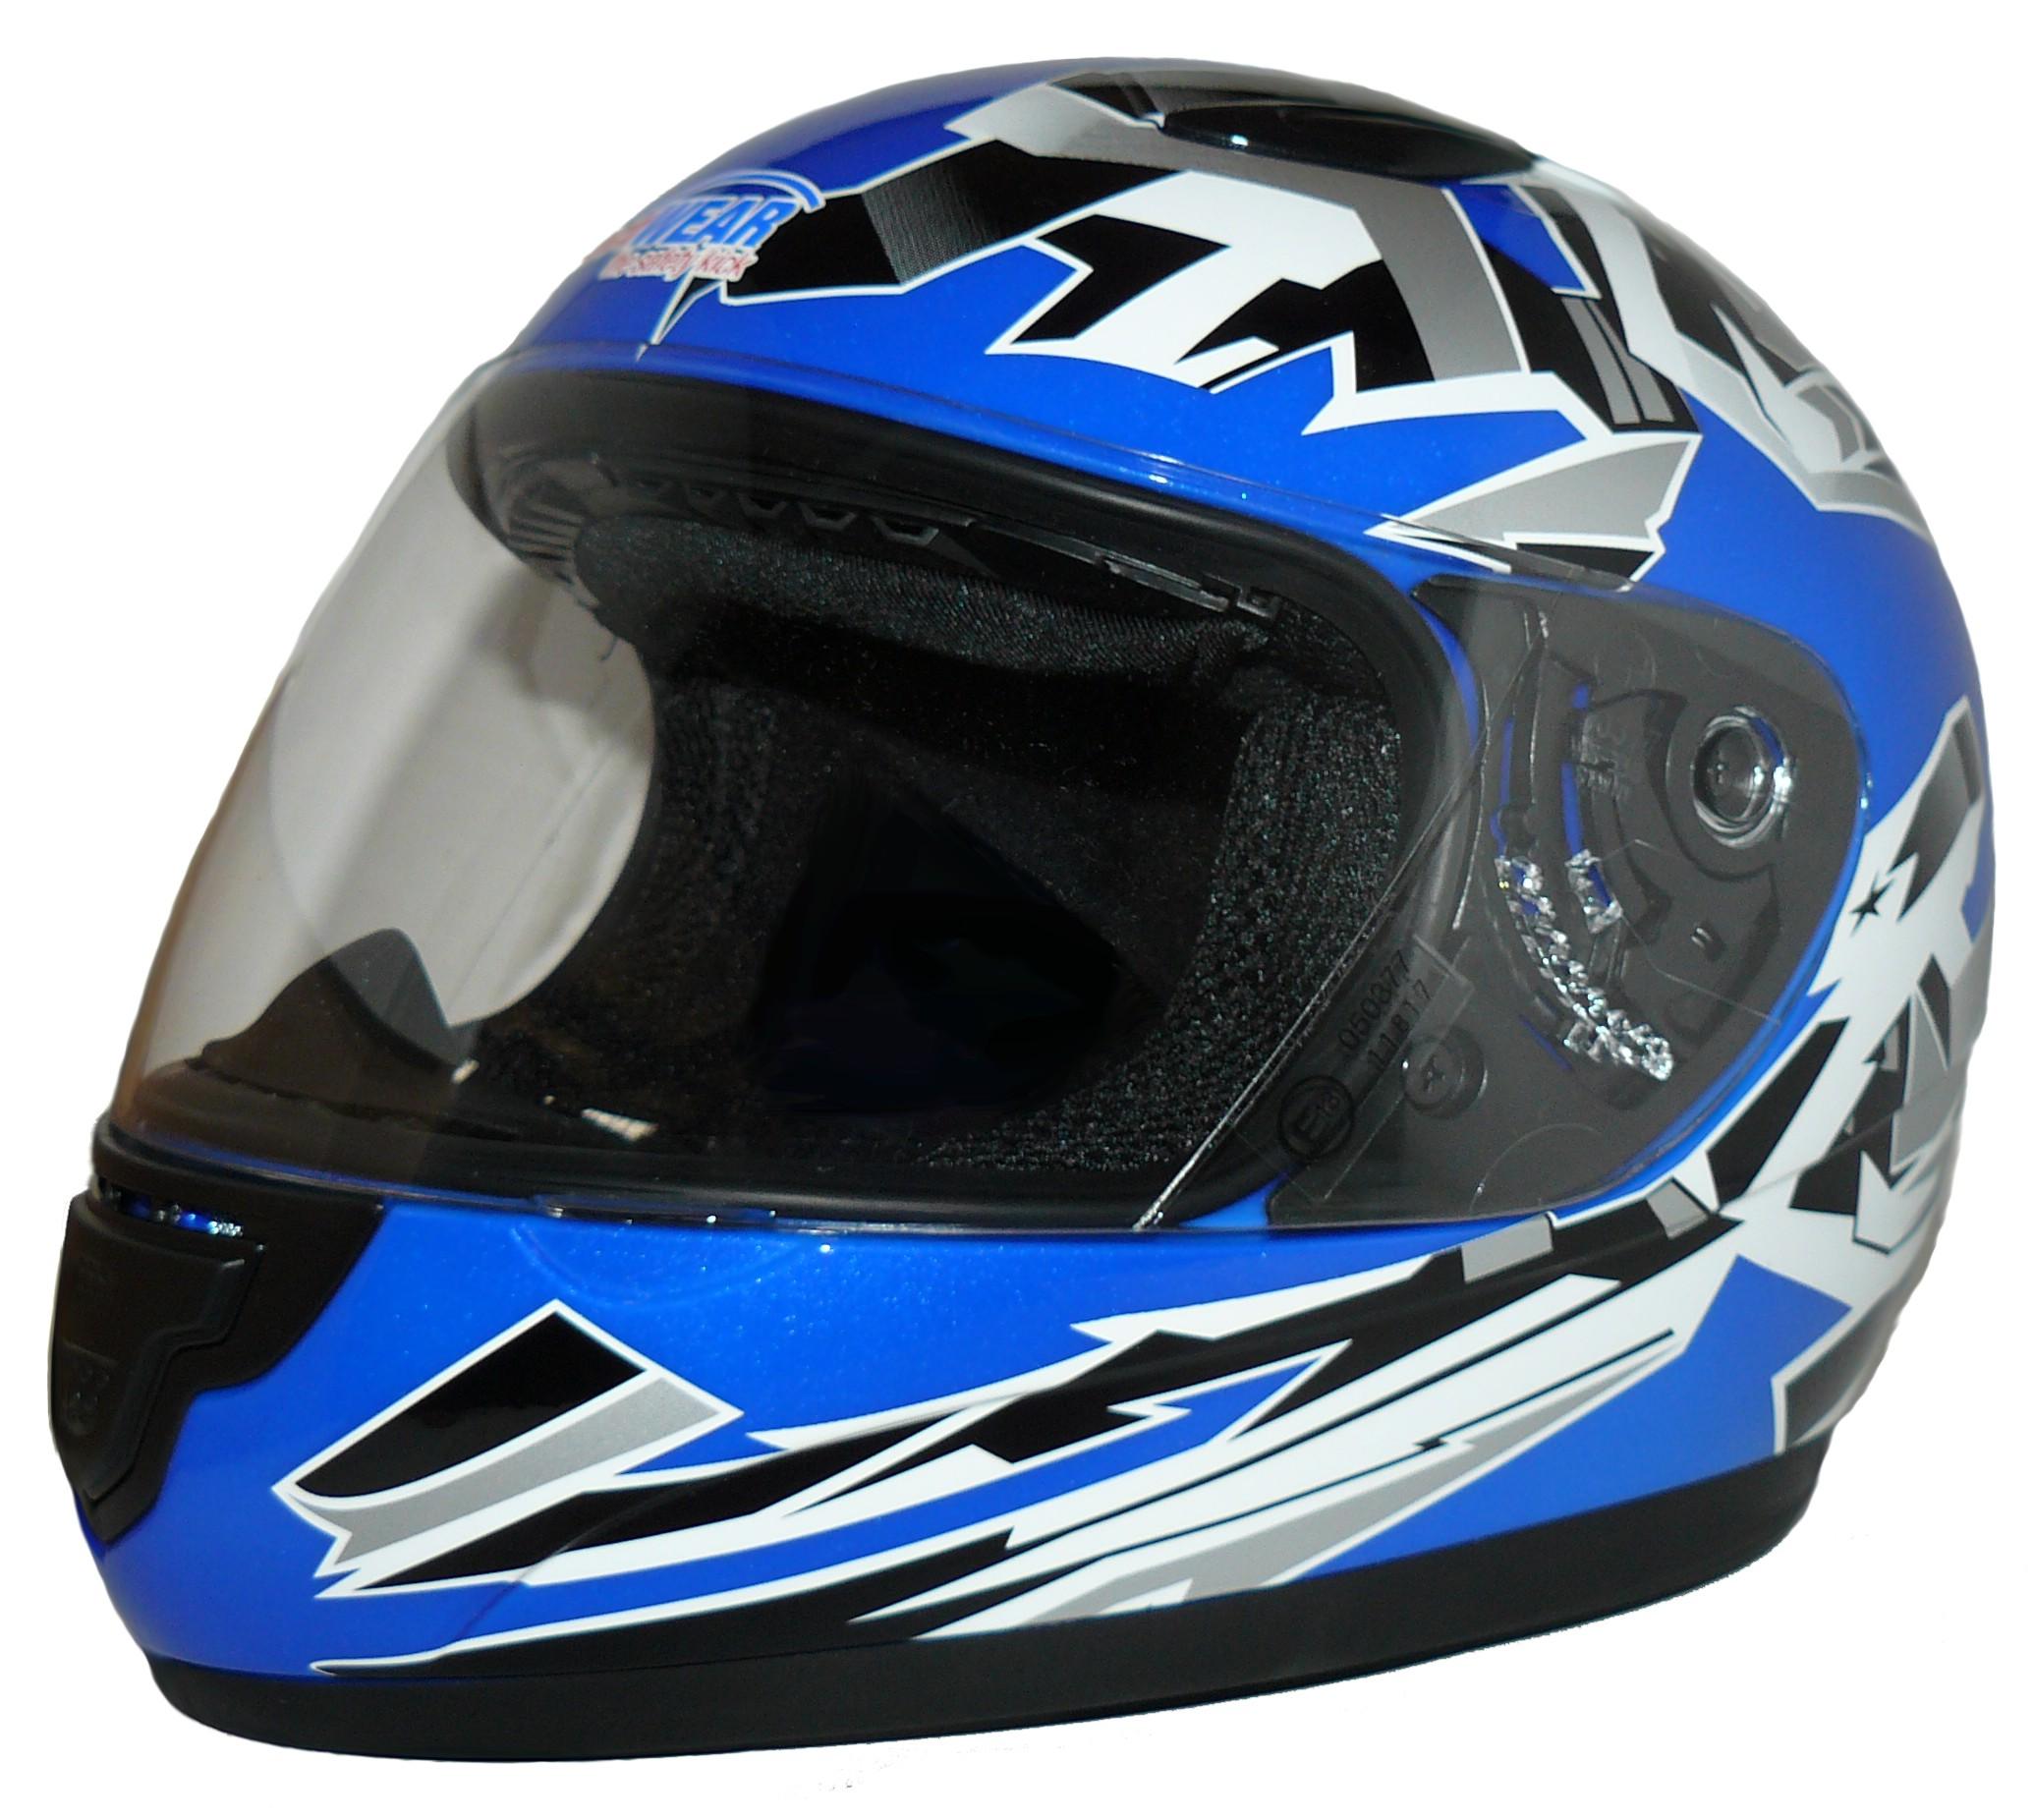 Kinder Motorradhelm blau mit Muster SA 03 BL